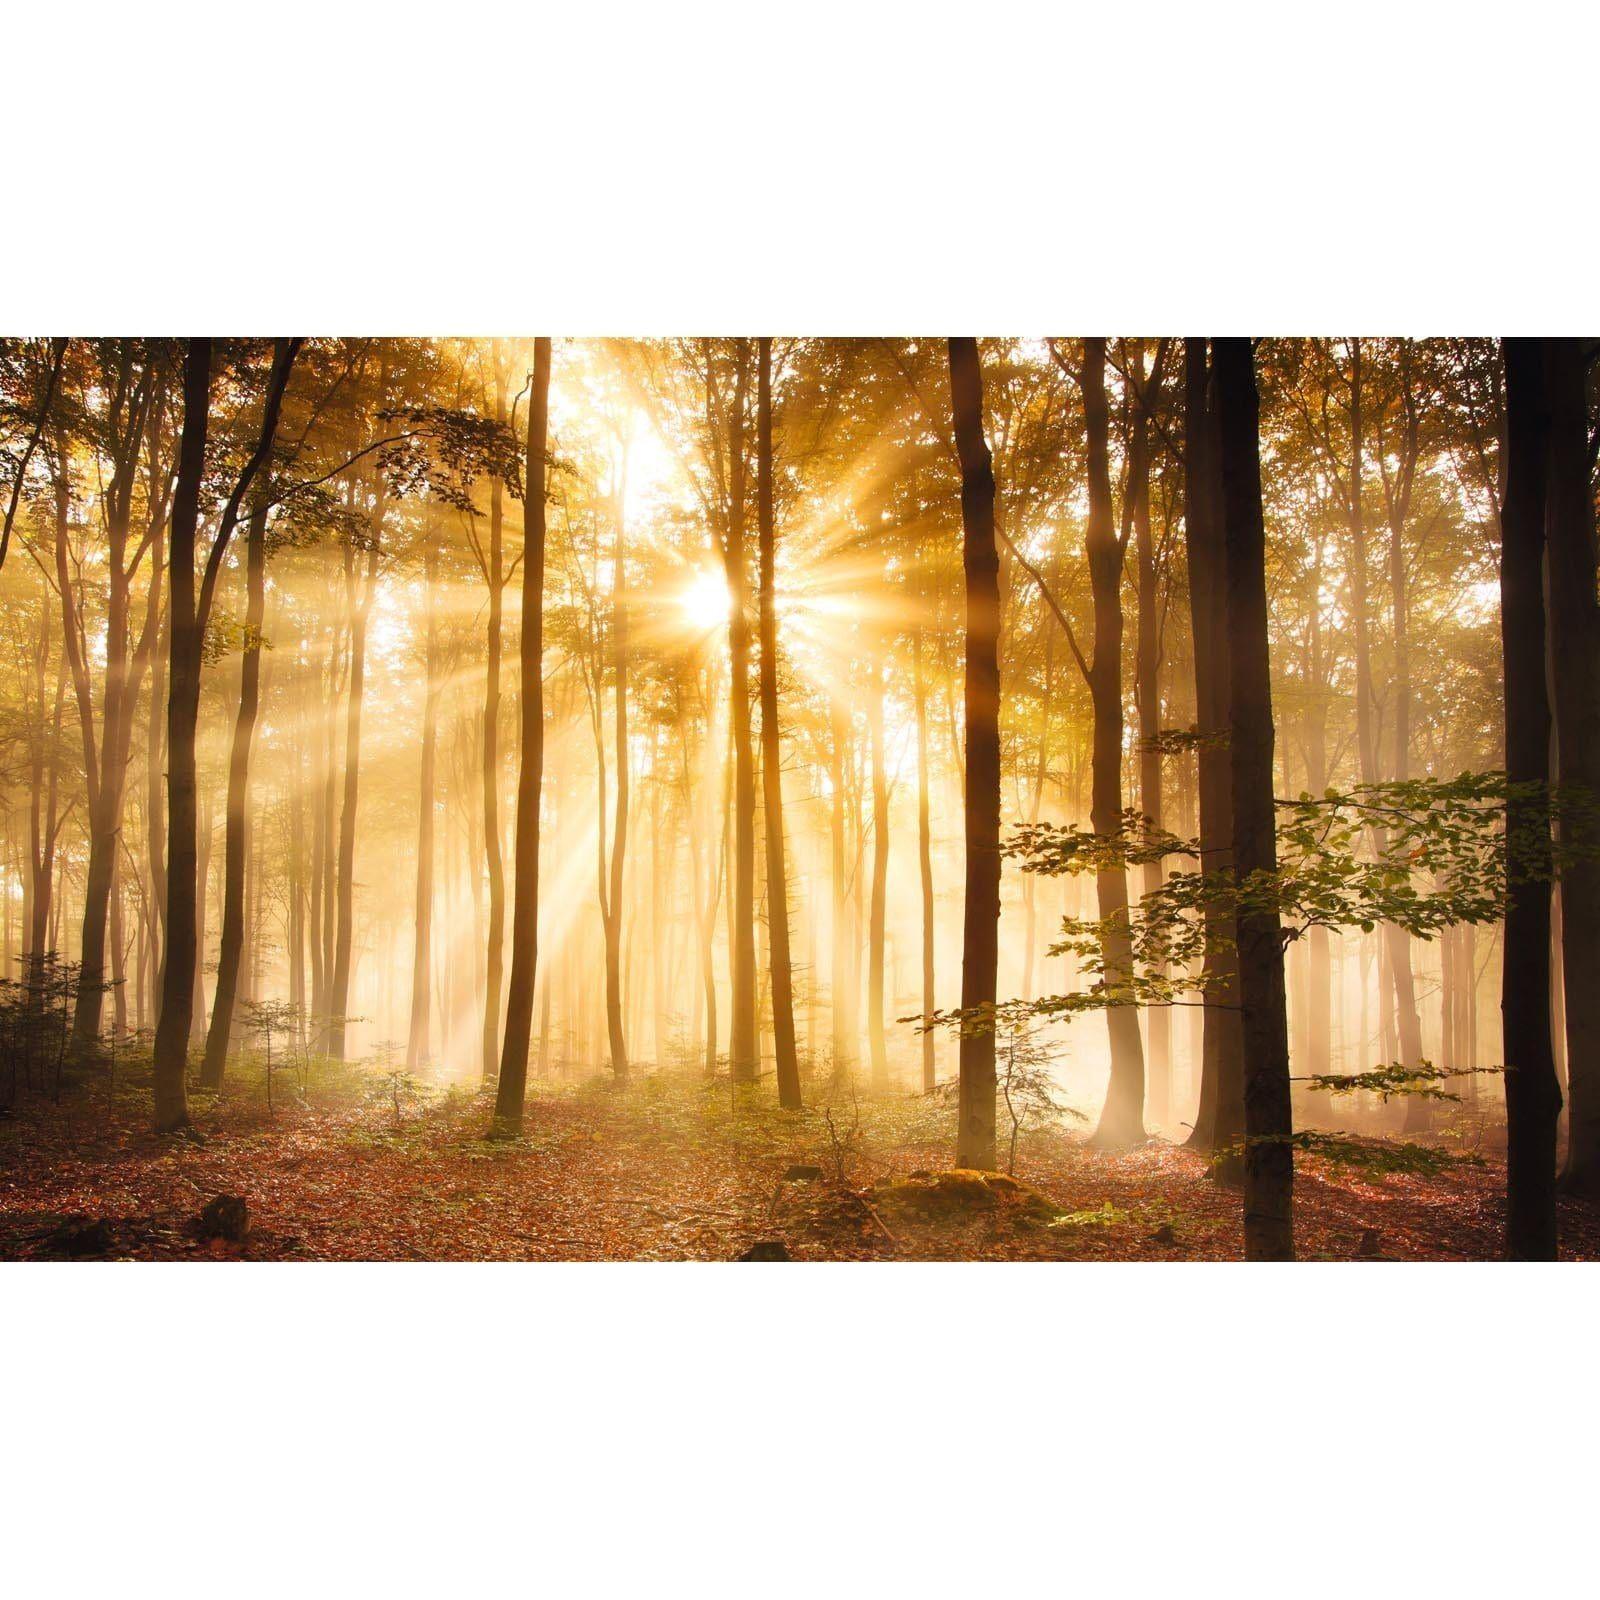 Leinwandbild ERLEUCHTETER WALD 78x135 cm (With images